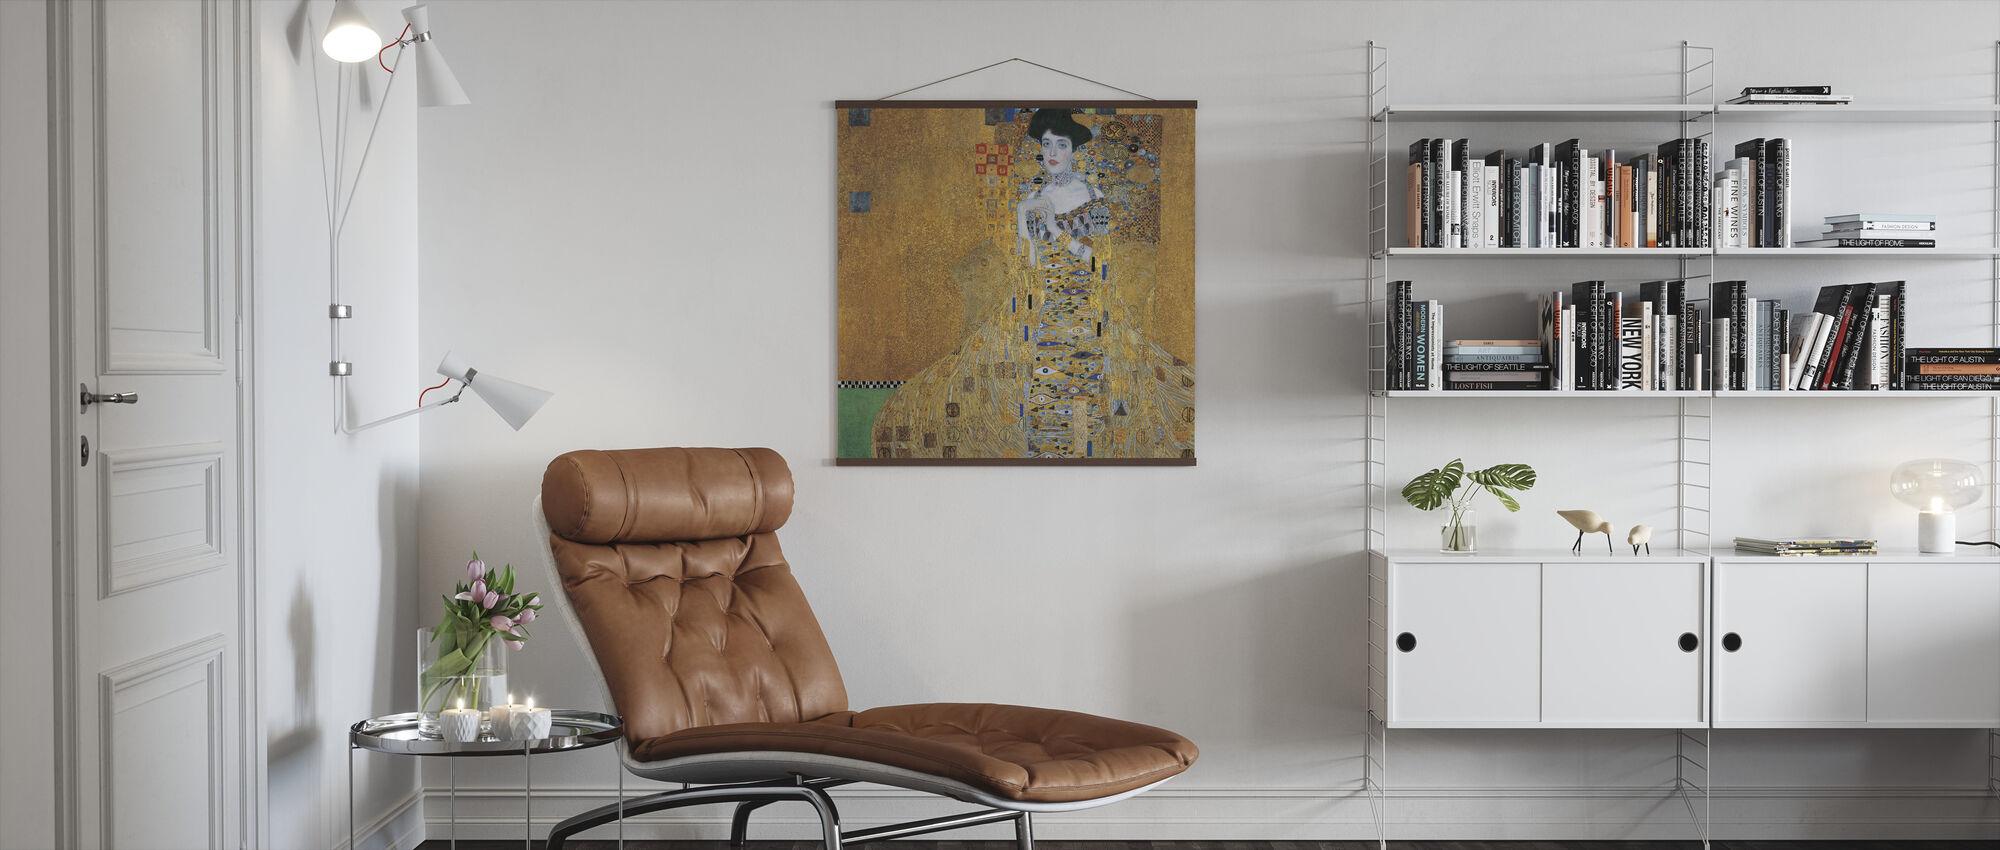 Klimt, Gustaw - Adele Bloch-Bauer I - Plakat - Pokój dzienny